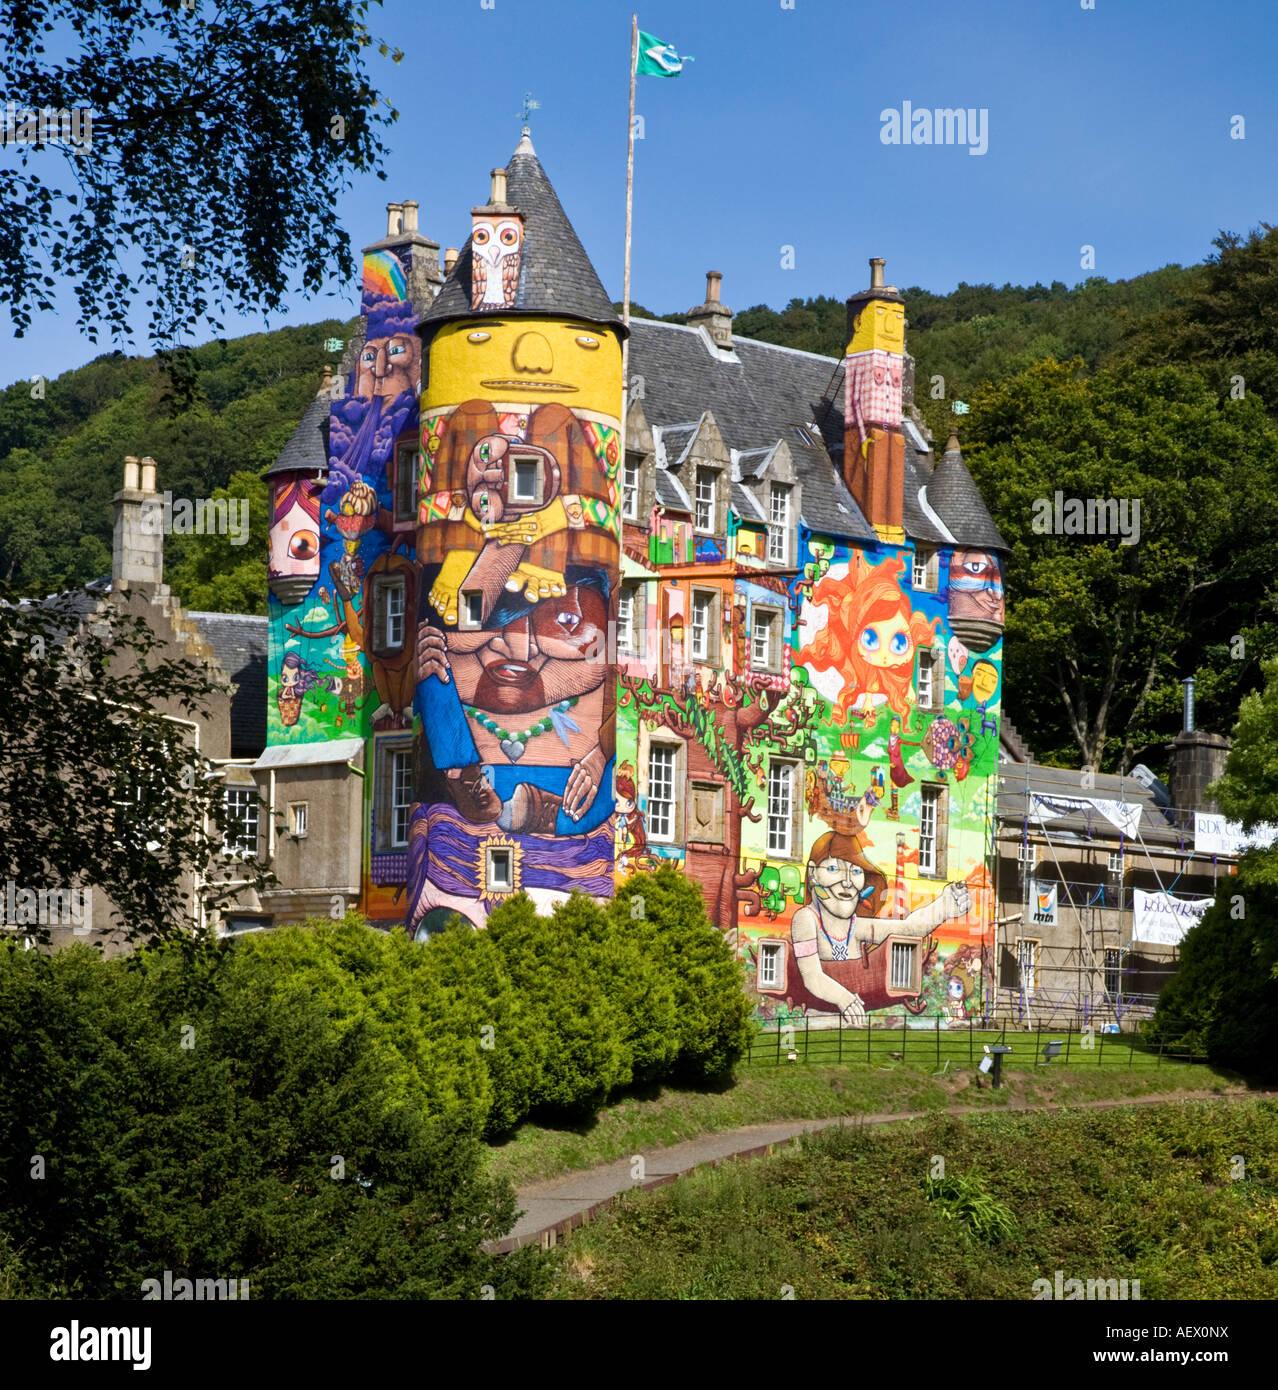 The graffiti project at Kelburn Castle Ayrshire painted by Brazilian artists Os Gemeos Nina Pandolfo and Nunca - Stock Image